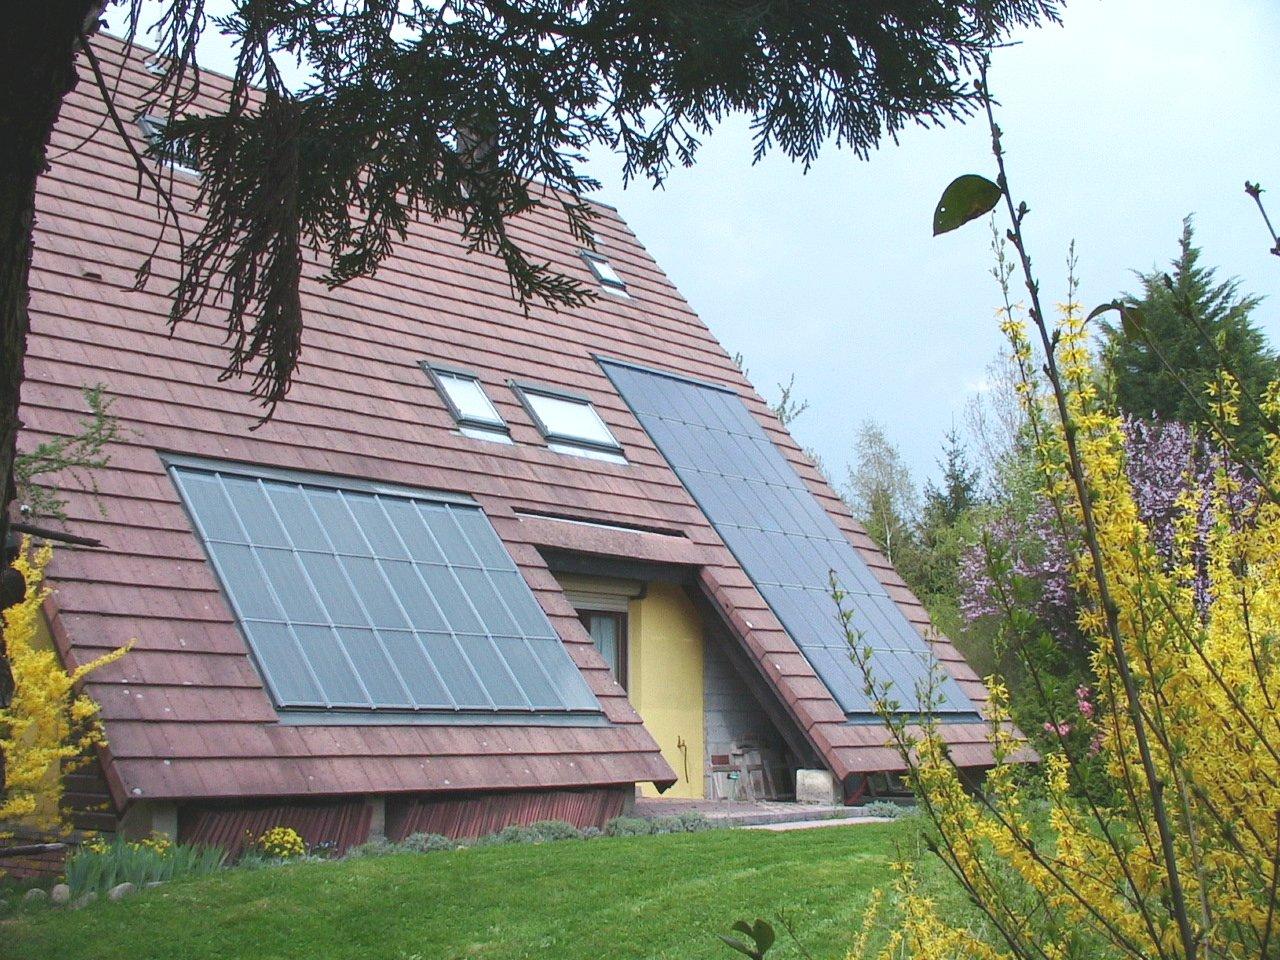 les diff rents types d 39 installations solaires. Black Bedroom Furniture Sets. Home Design Ideas